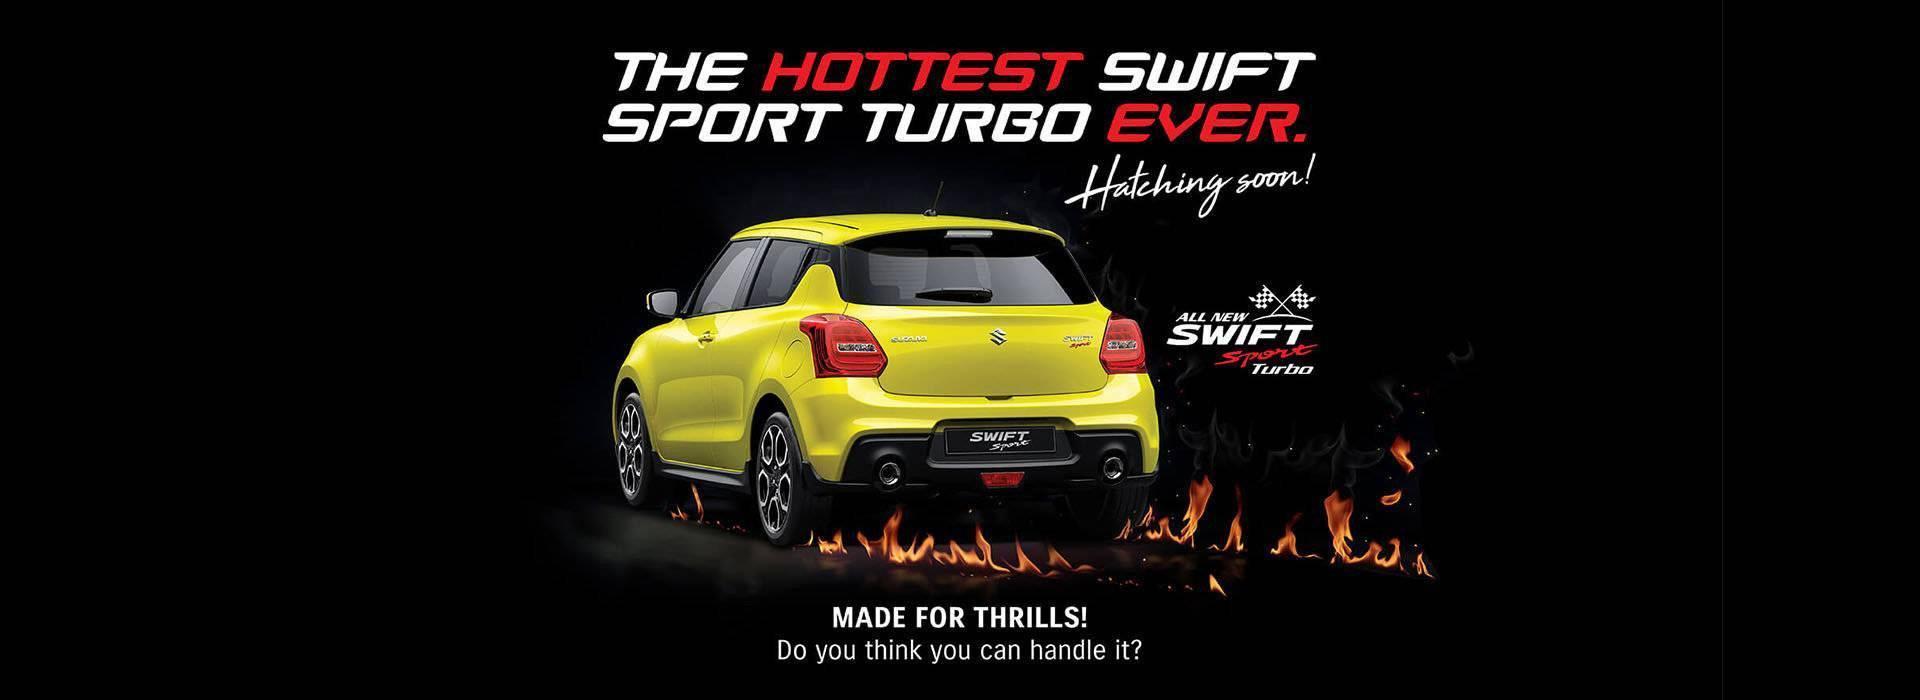 Parry NQ Suzuki Swift Sport Turbo